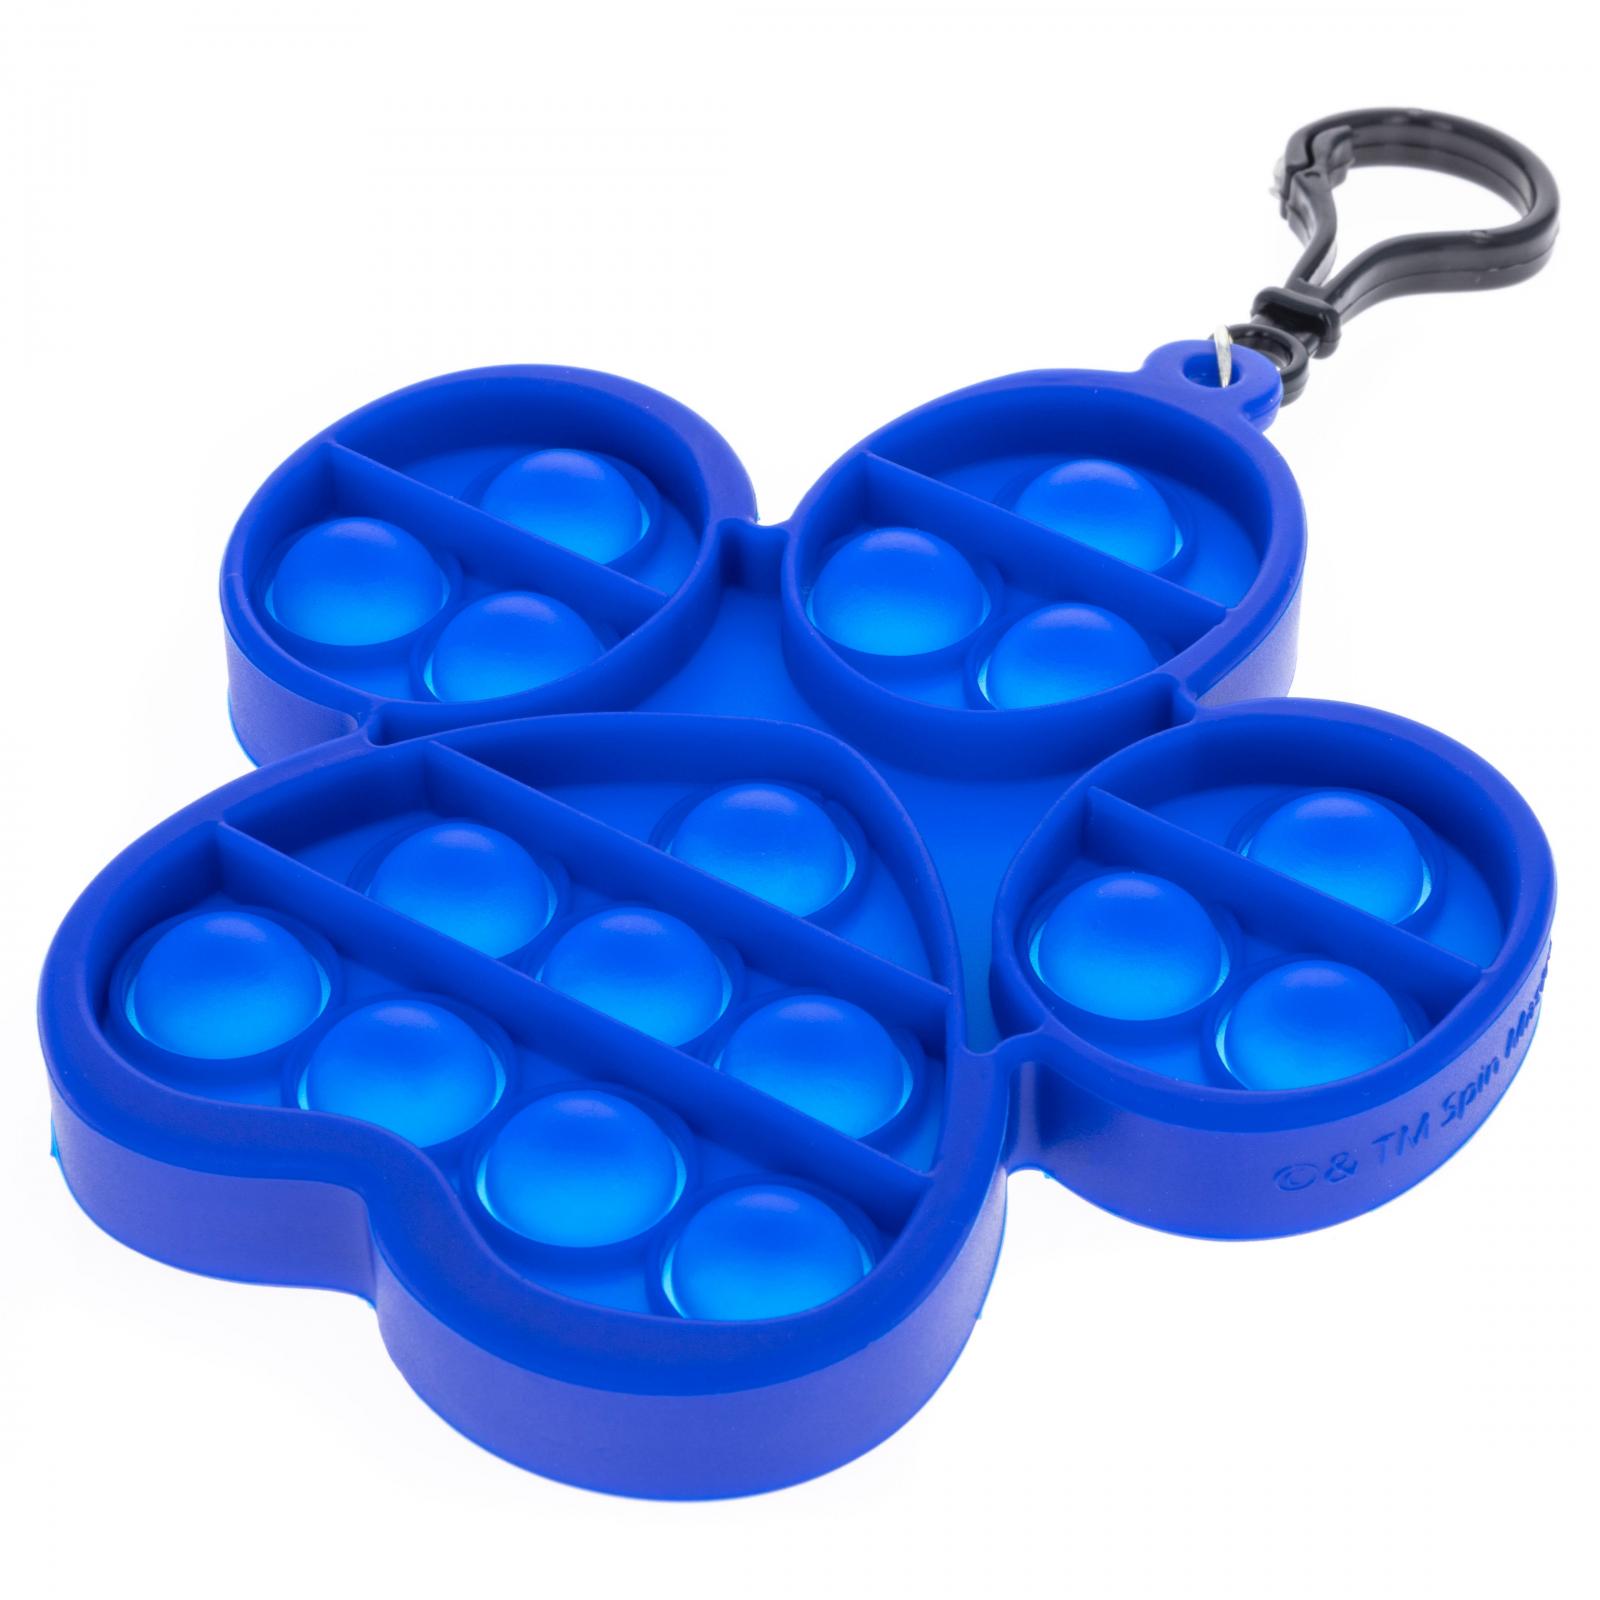 Paw Patrol Push Pop It Sensory Fidget Toy Stress Relief Blue